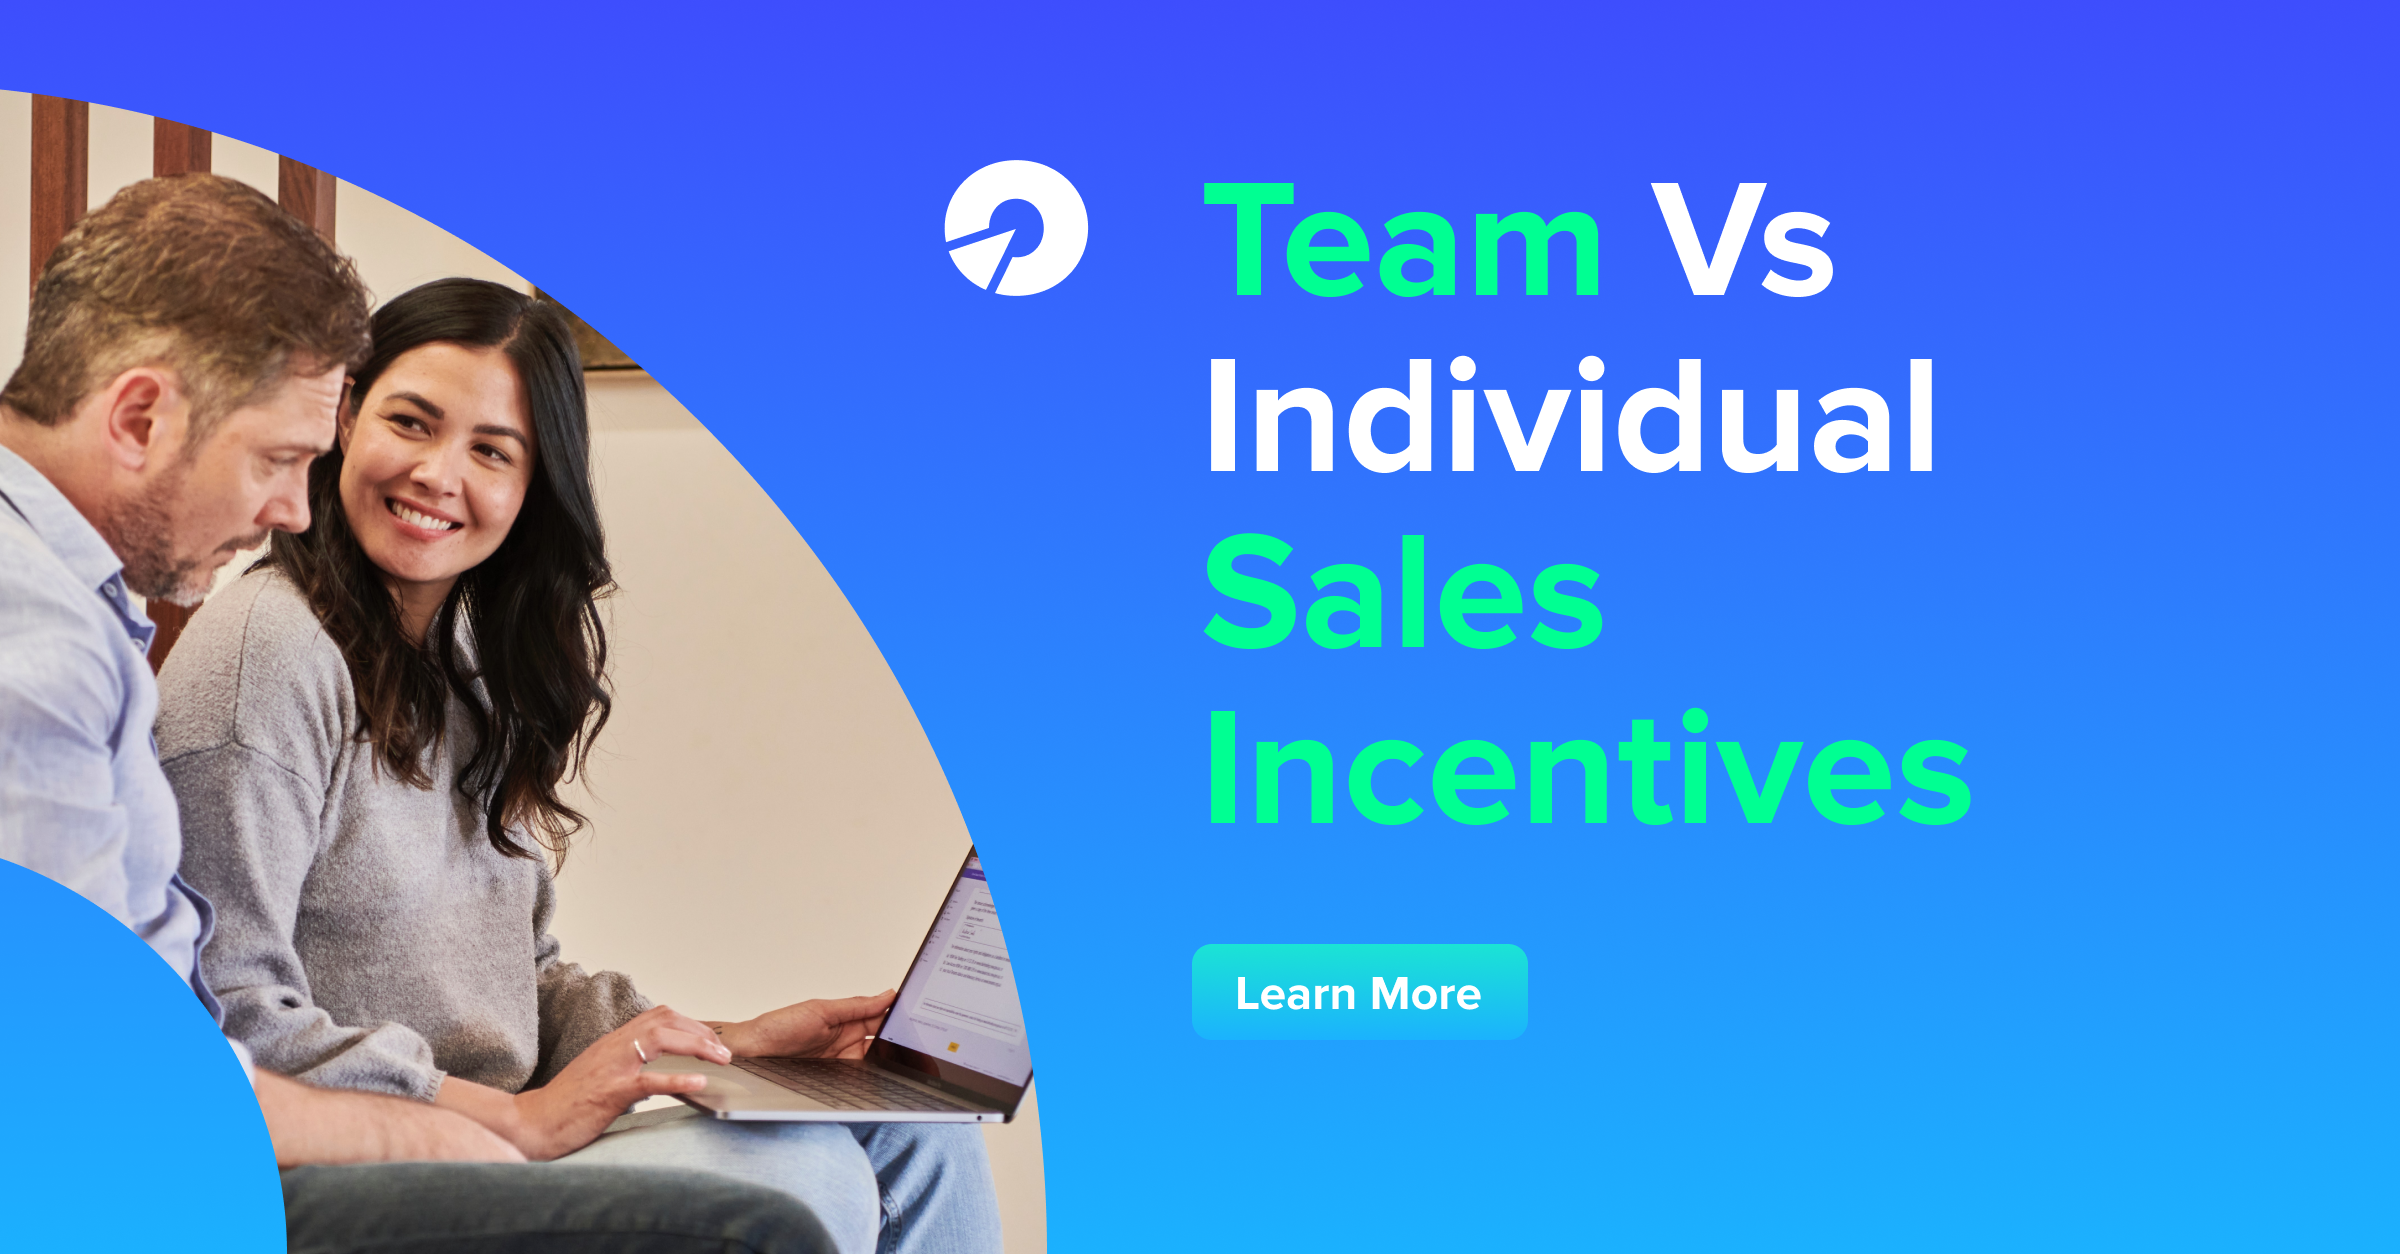 Team Vs Individual Incentives